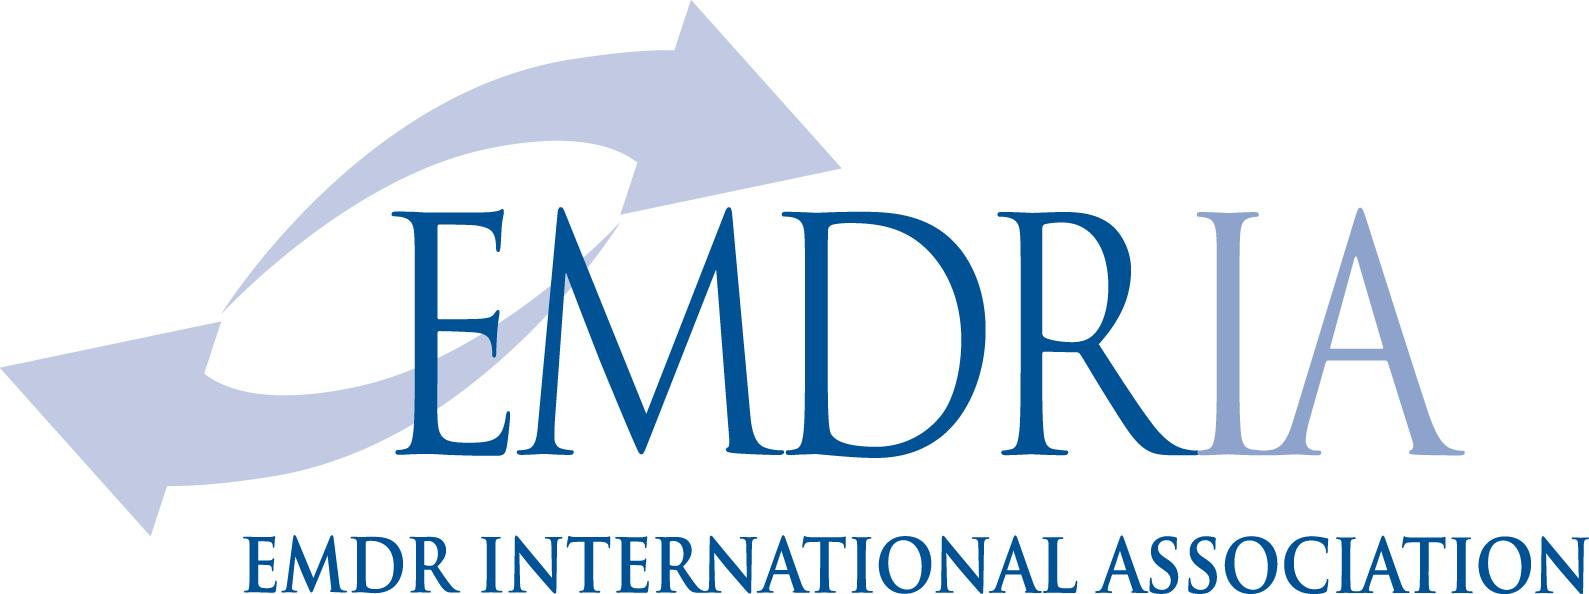 Emdr International Association 501c Guidestar Profile